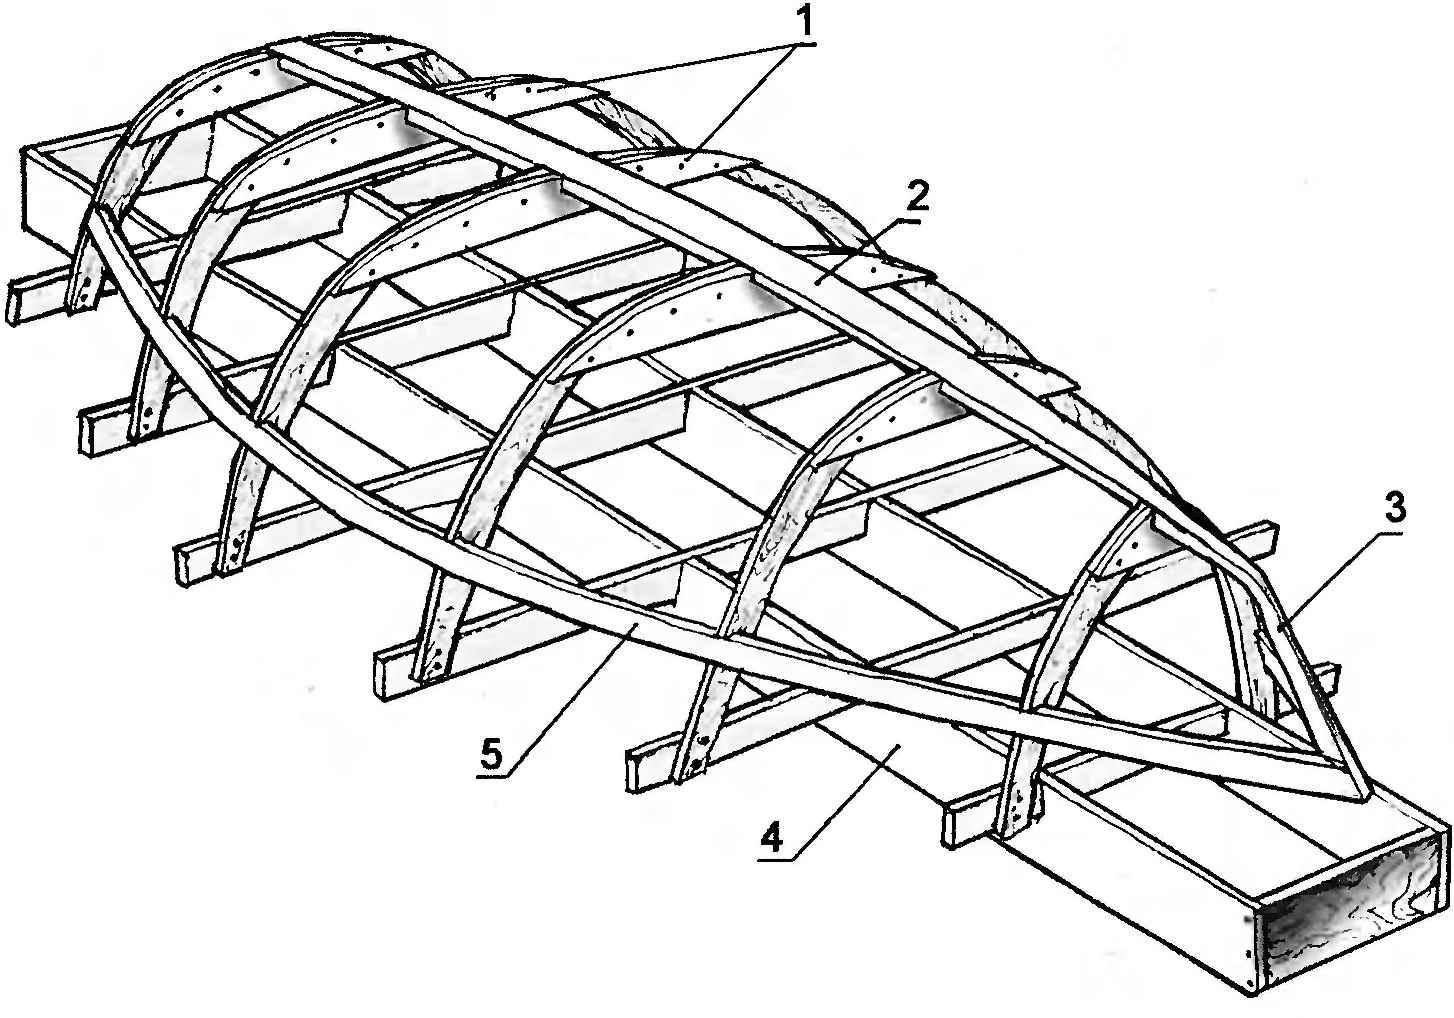 Рис. 1. Набор корпуса деревянного судна на стапеле